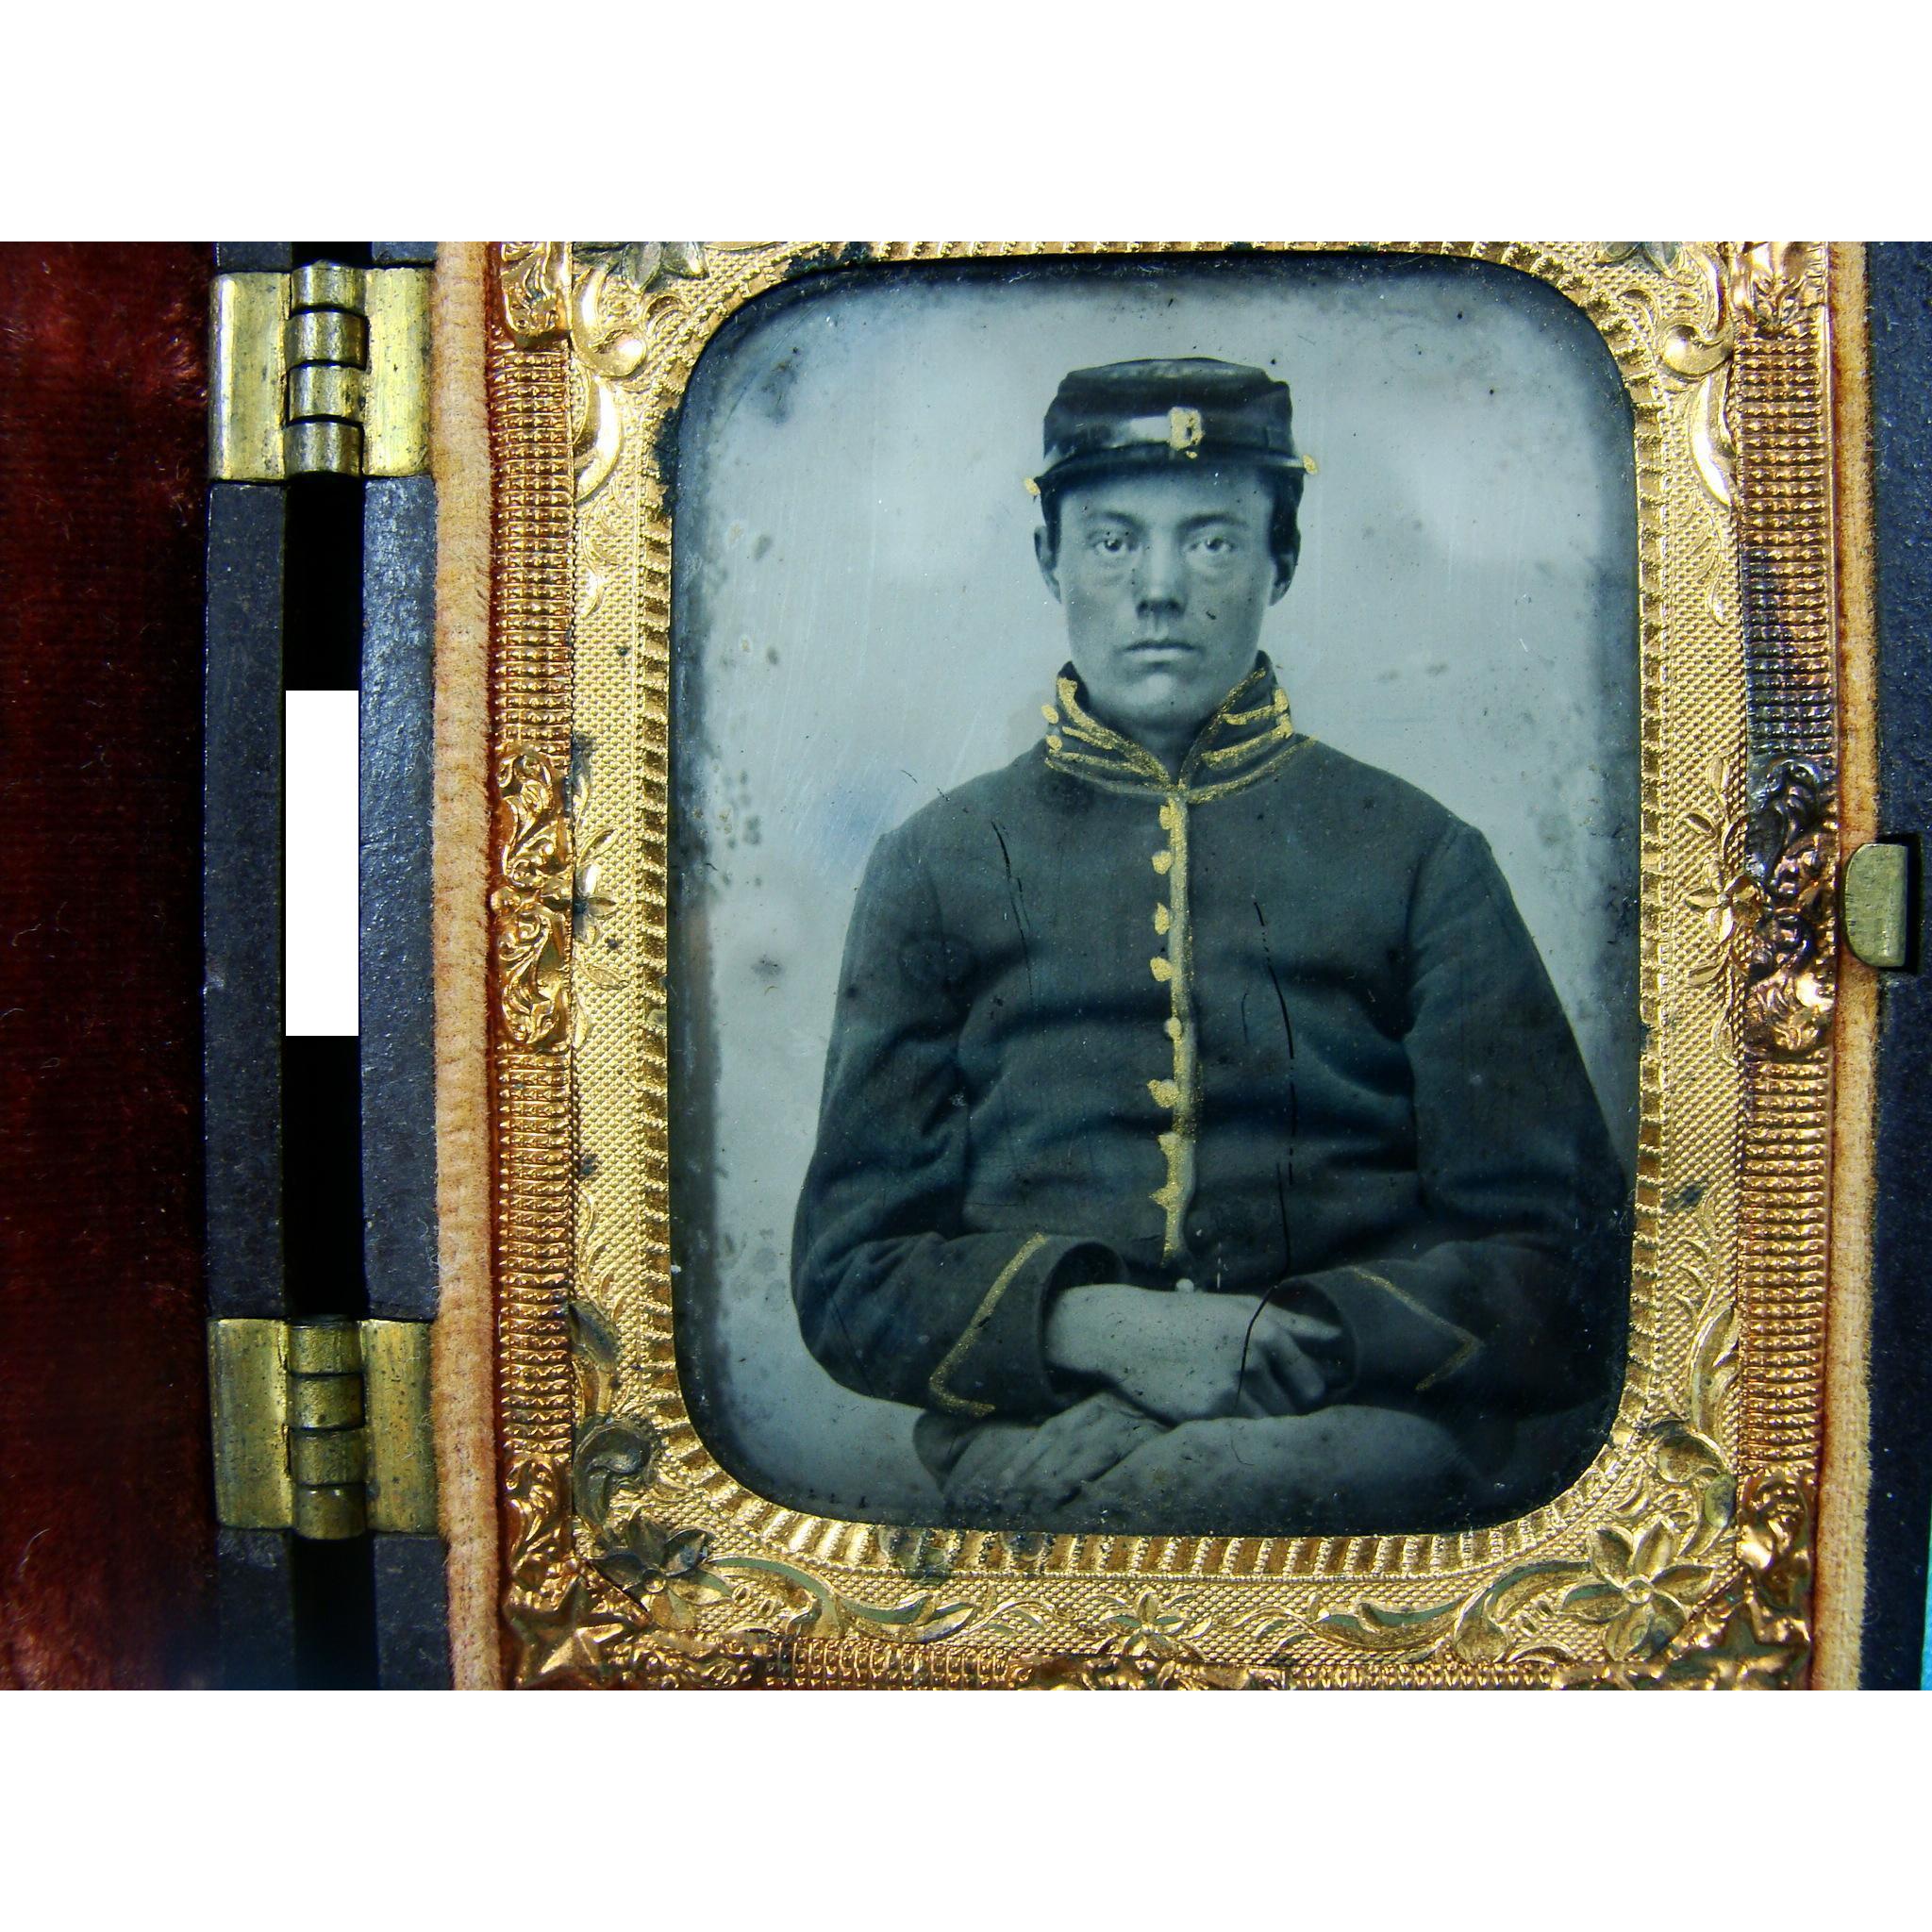 Tin Type Civil War Soldier